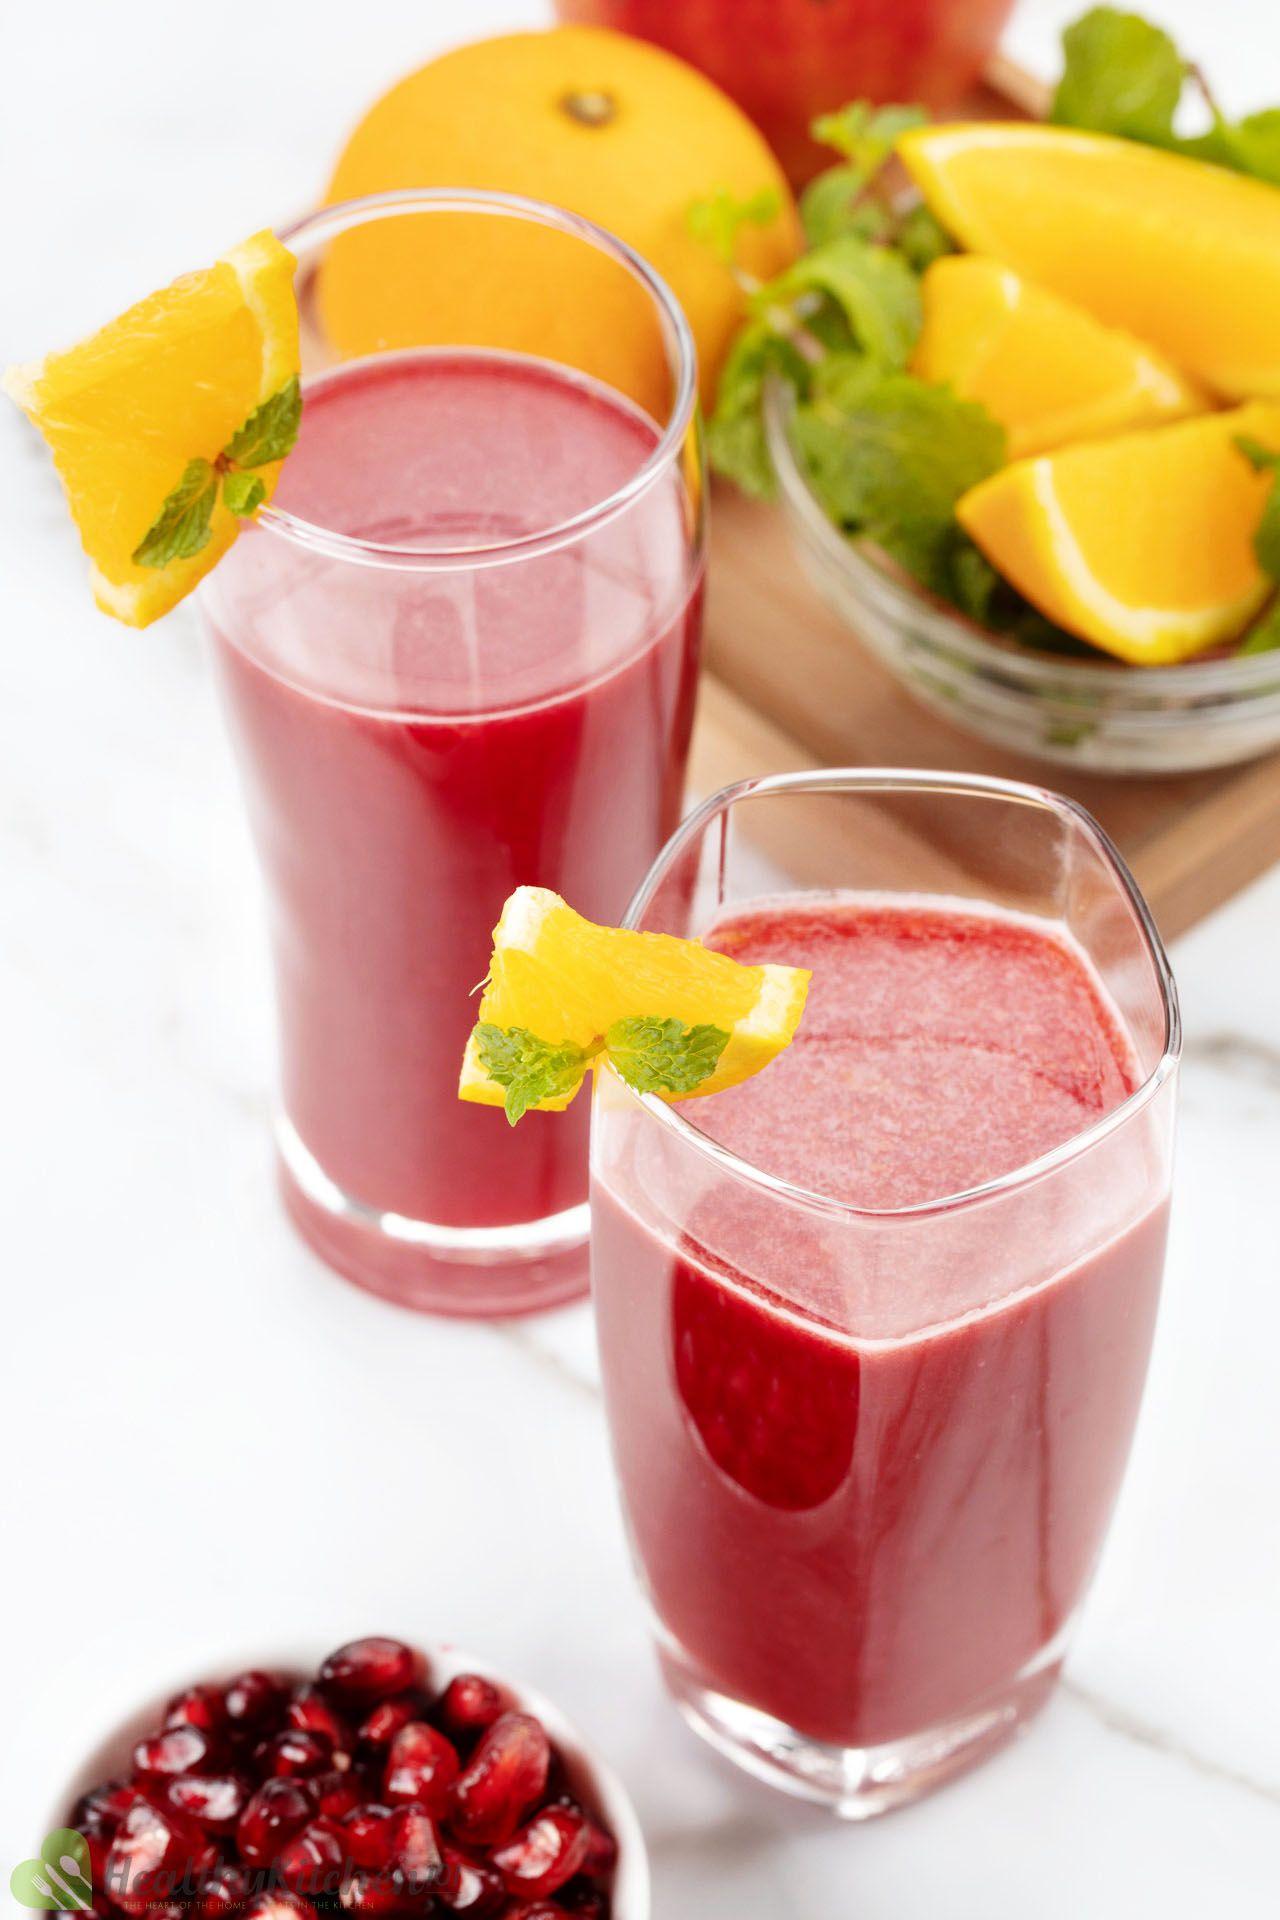 homemade orange pomegranate juice